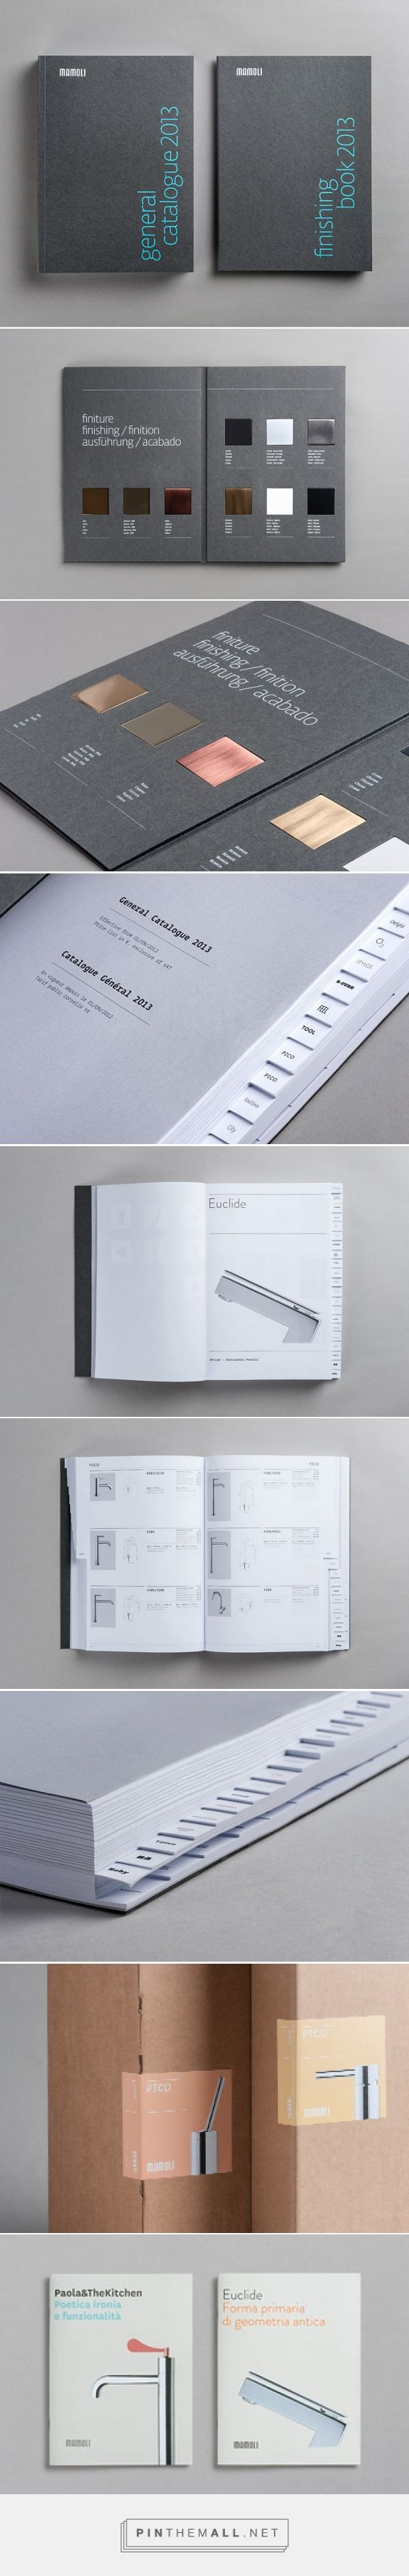 Portfolio - Project - mamoli catalogue and finishing book | LS graphic design - created via https://pinthemall.net